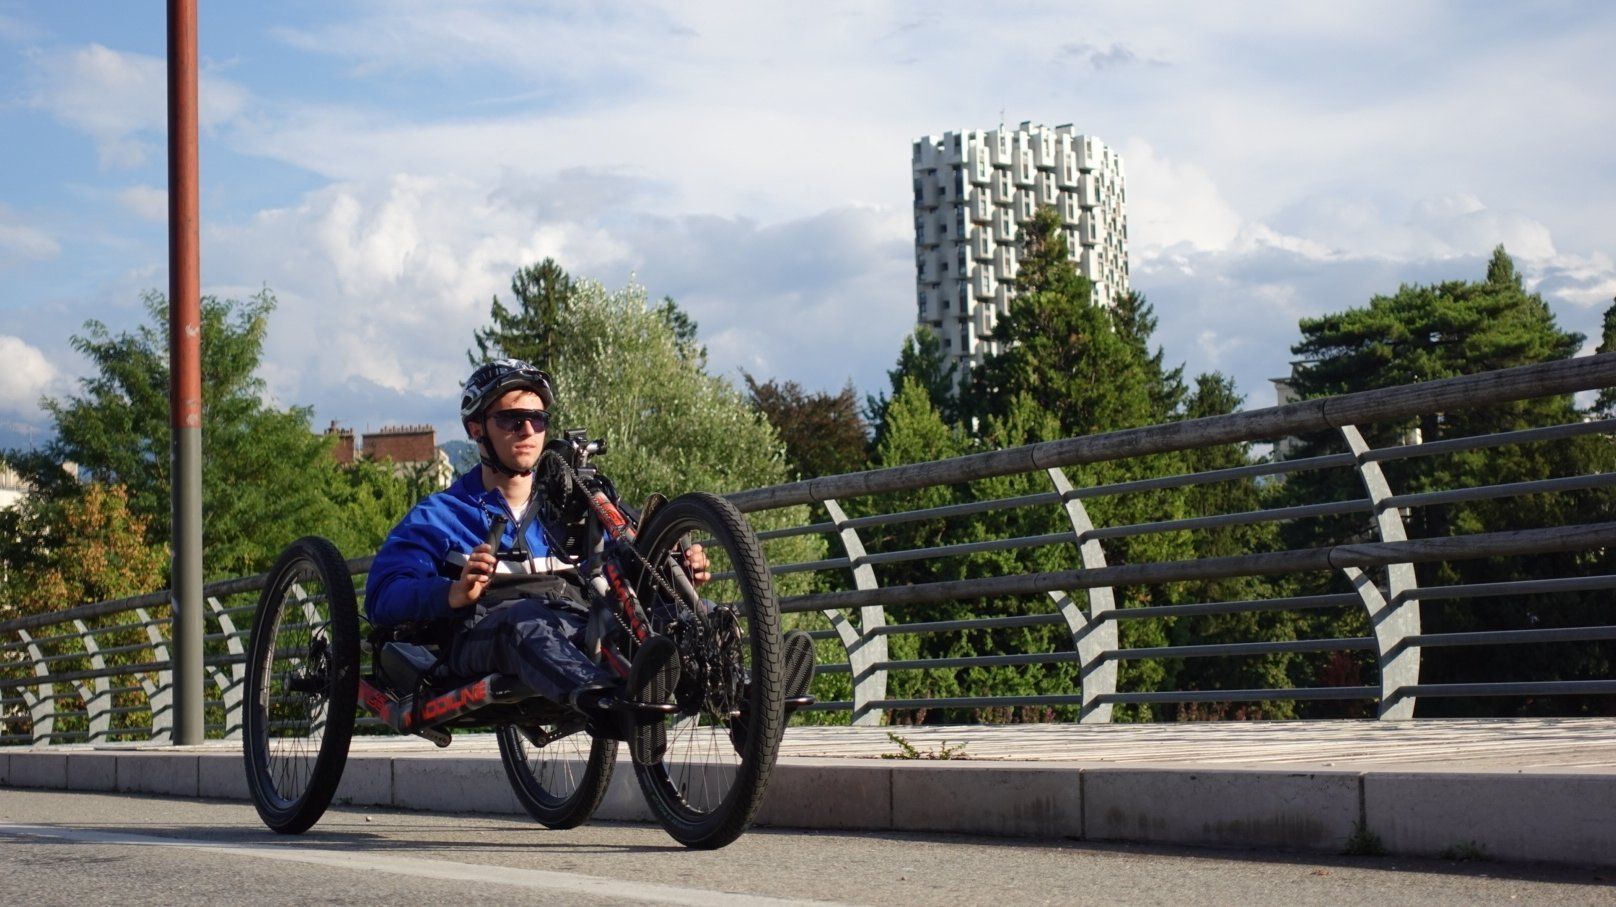 Jonas Bell est en train de relier Martigny à Barcelone avec son handbike.